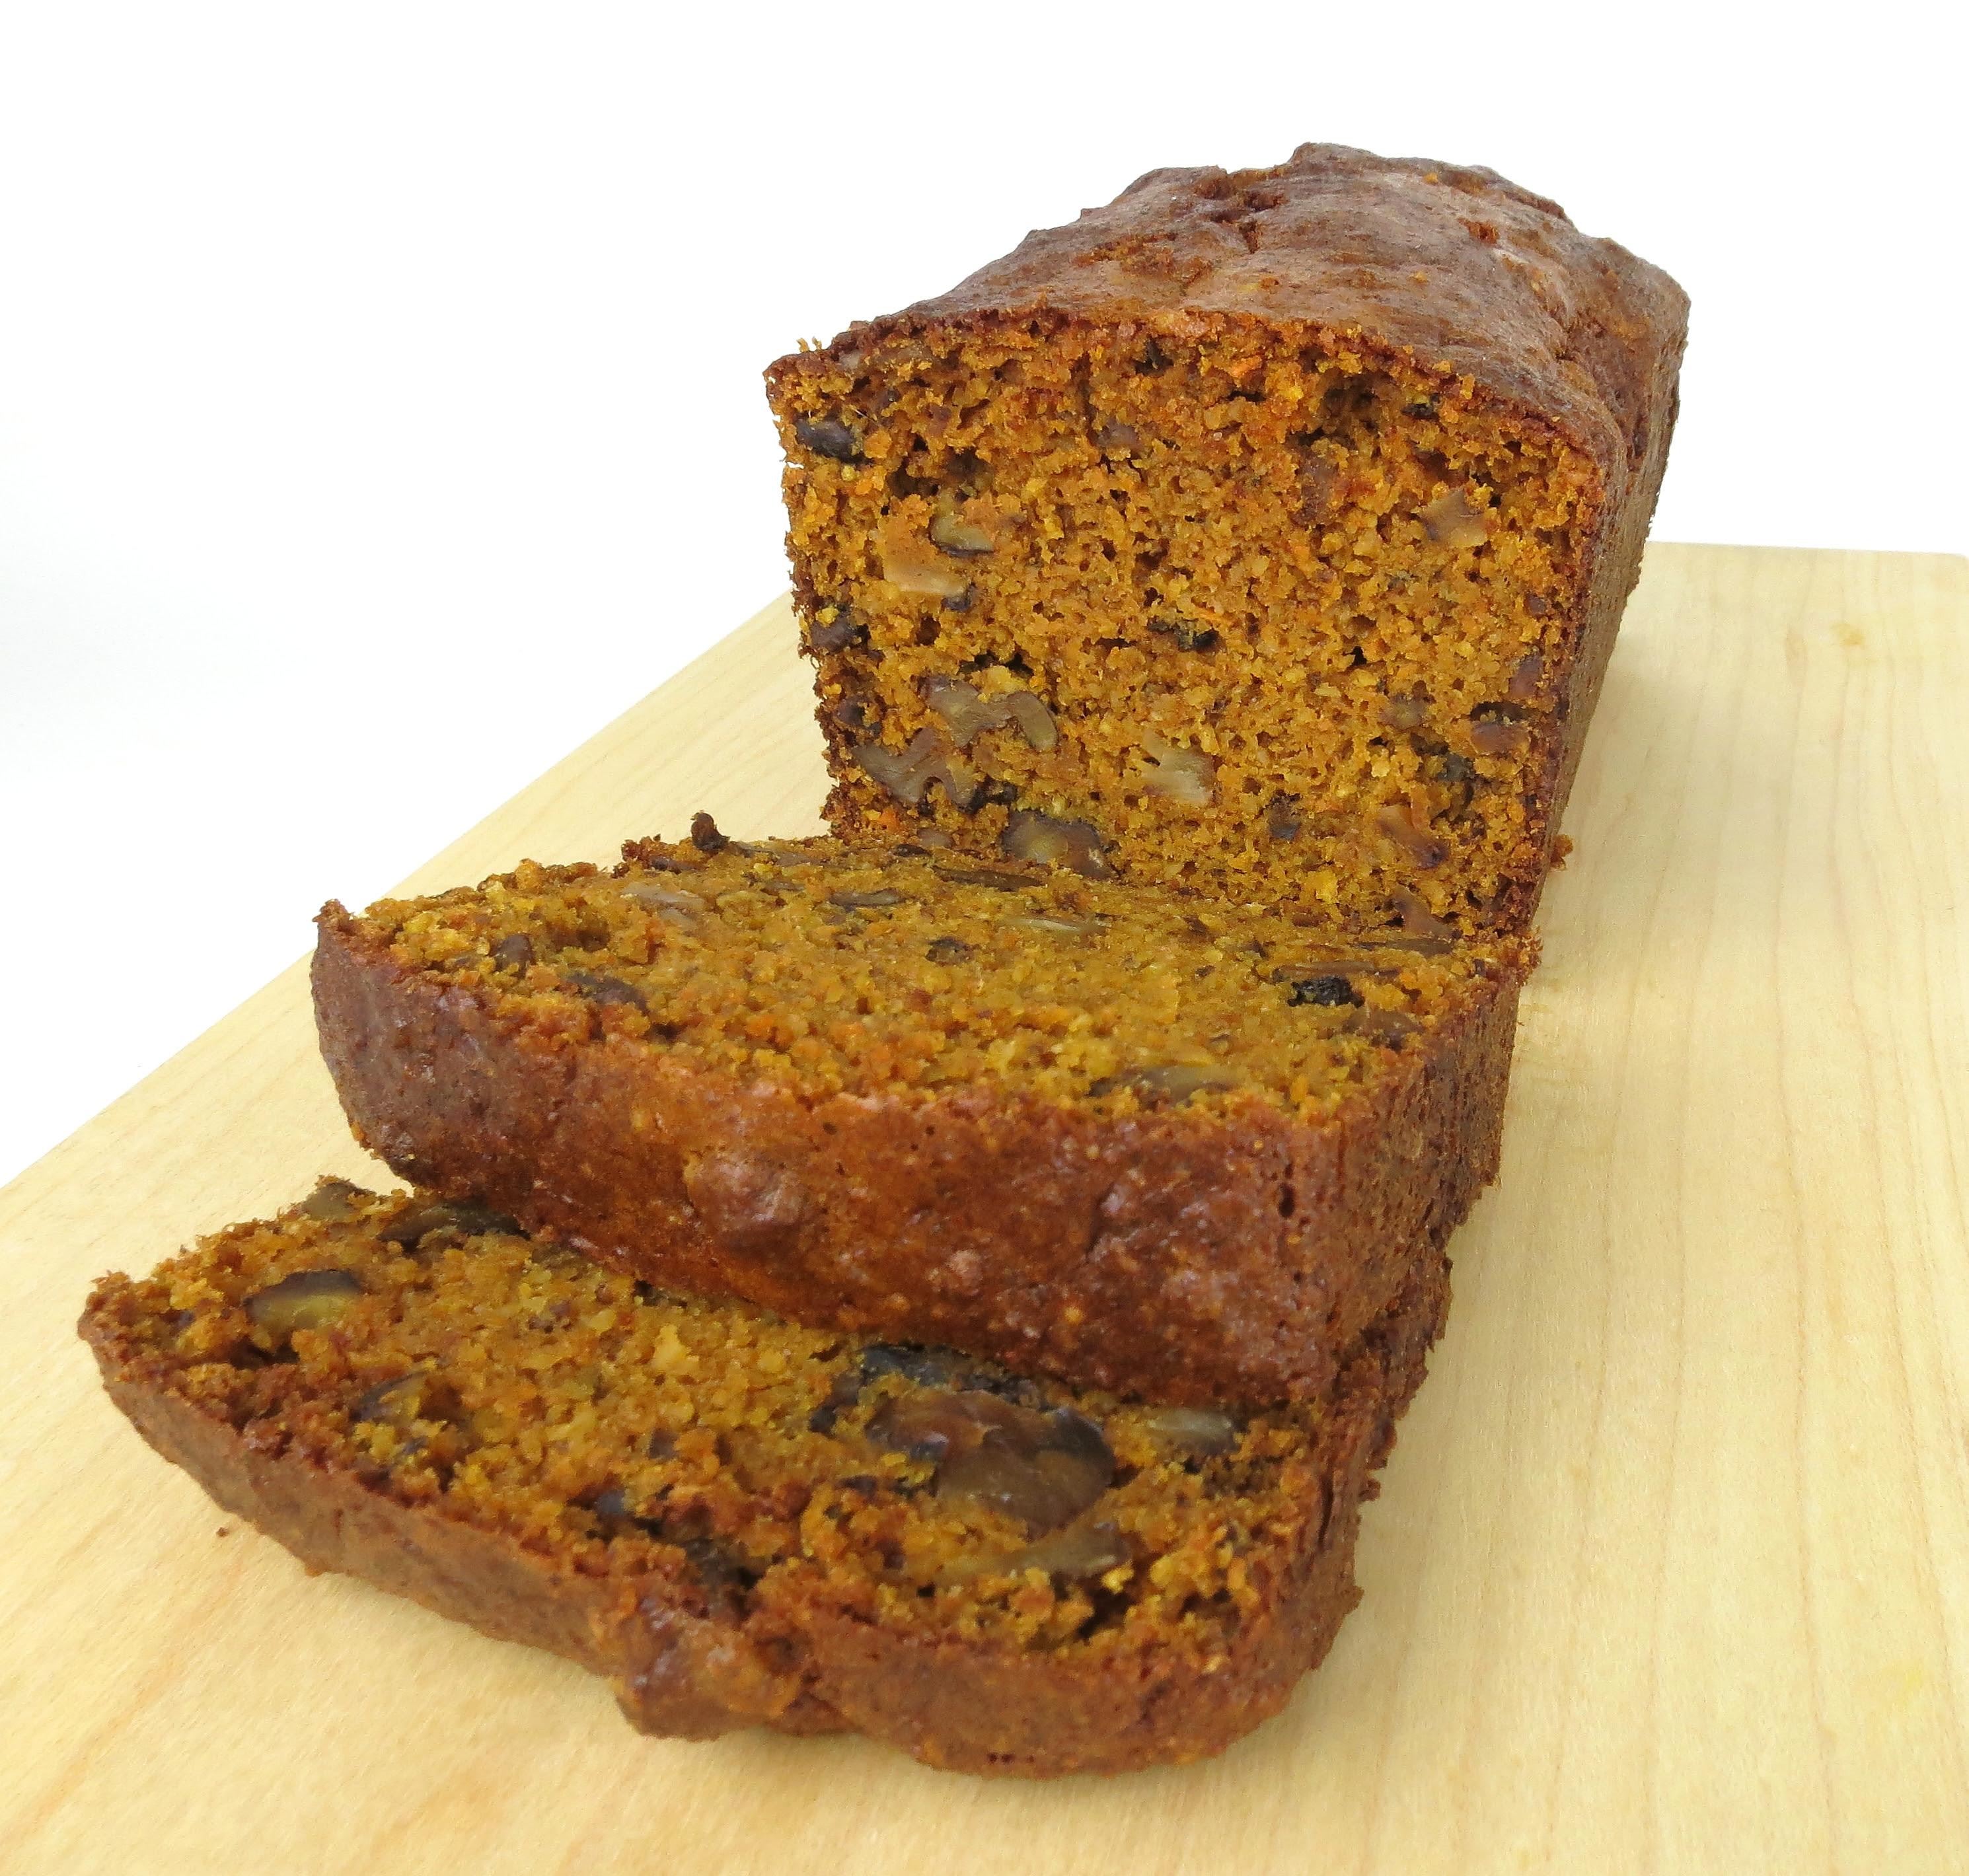 Easy Paleo Sweet Potato Bread - Jane's Healthy Kitchen